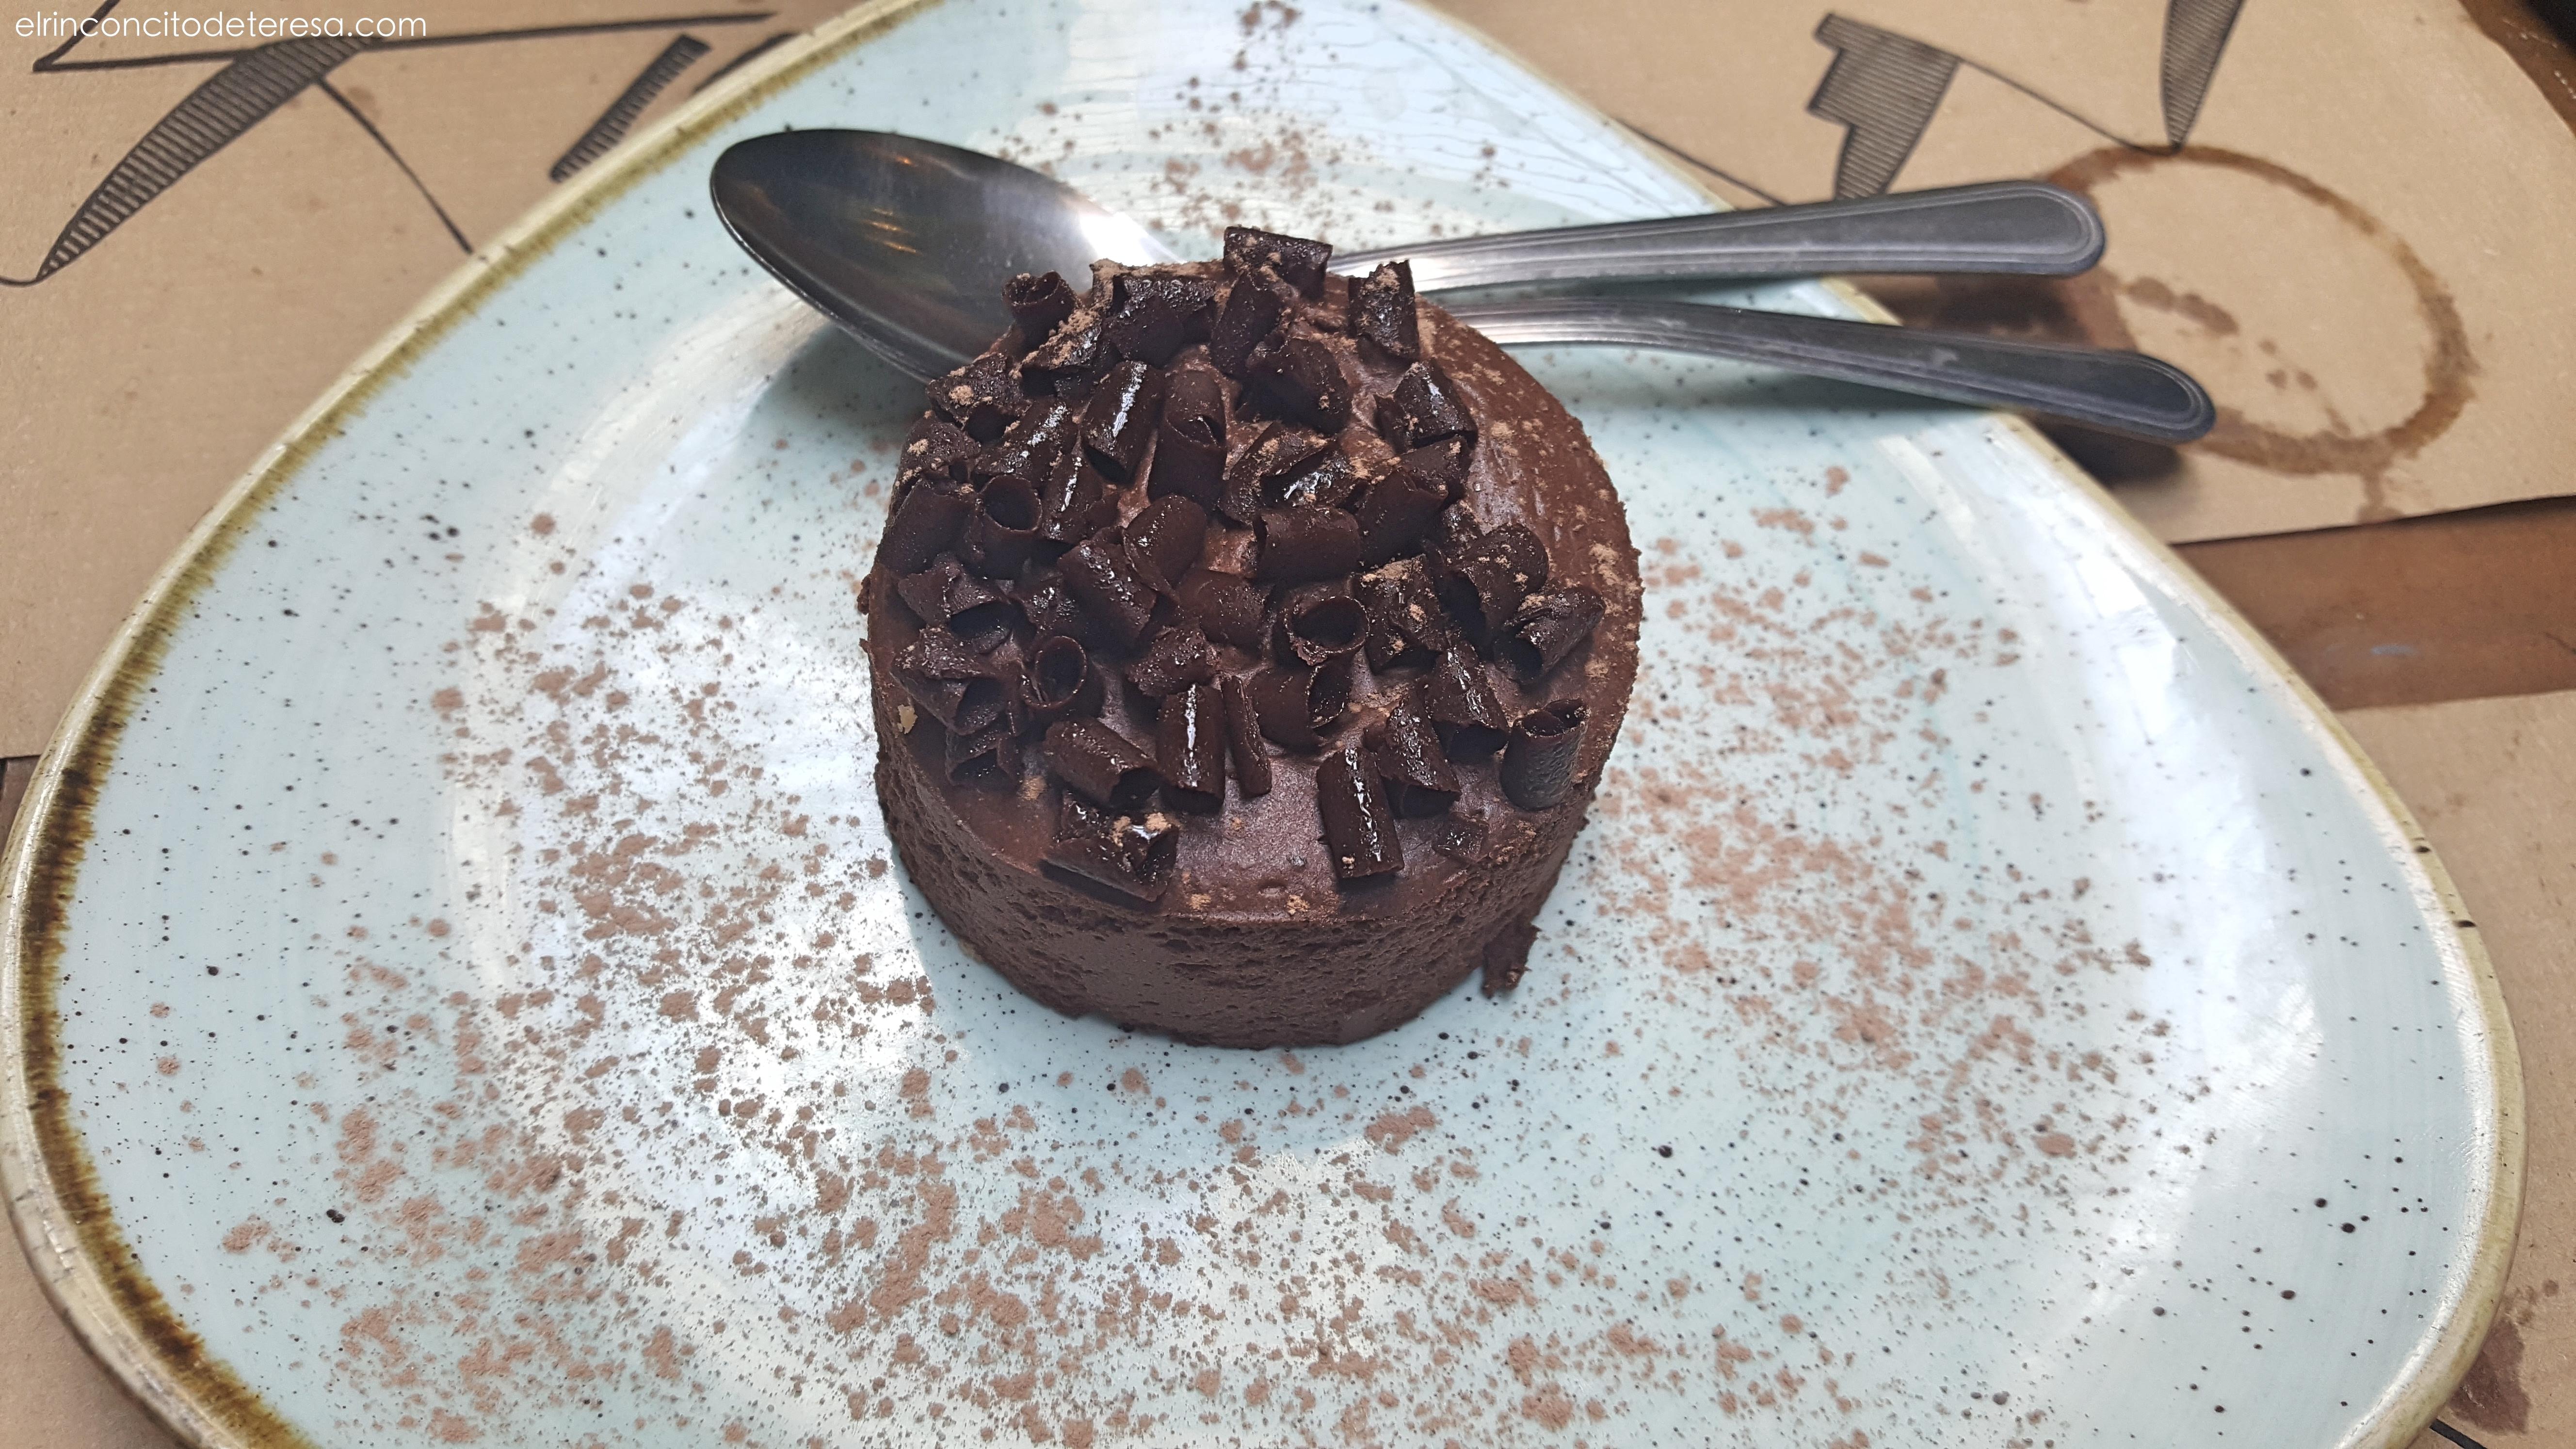 pirineu-en-boca-pastel-chocolate